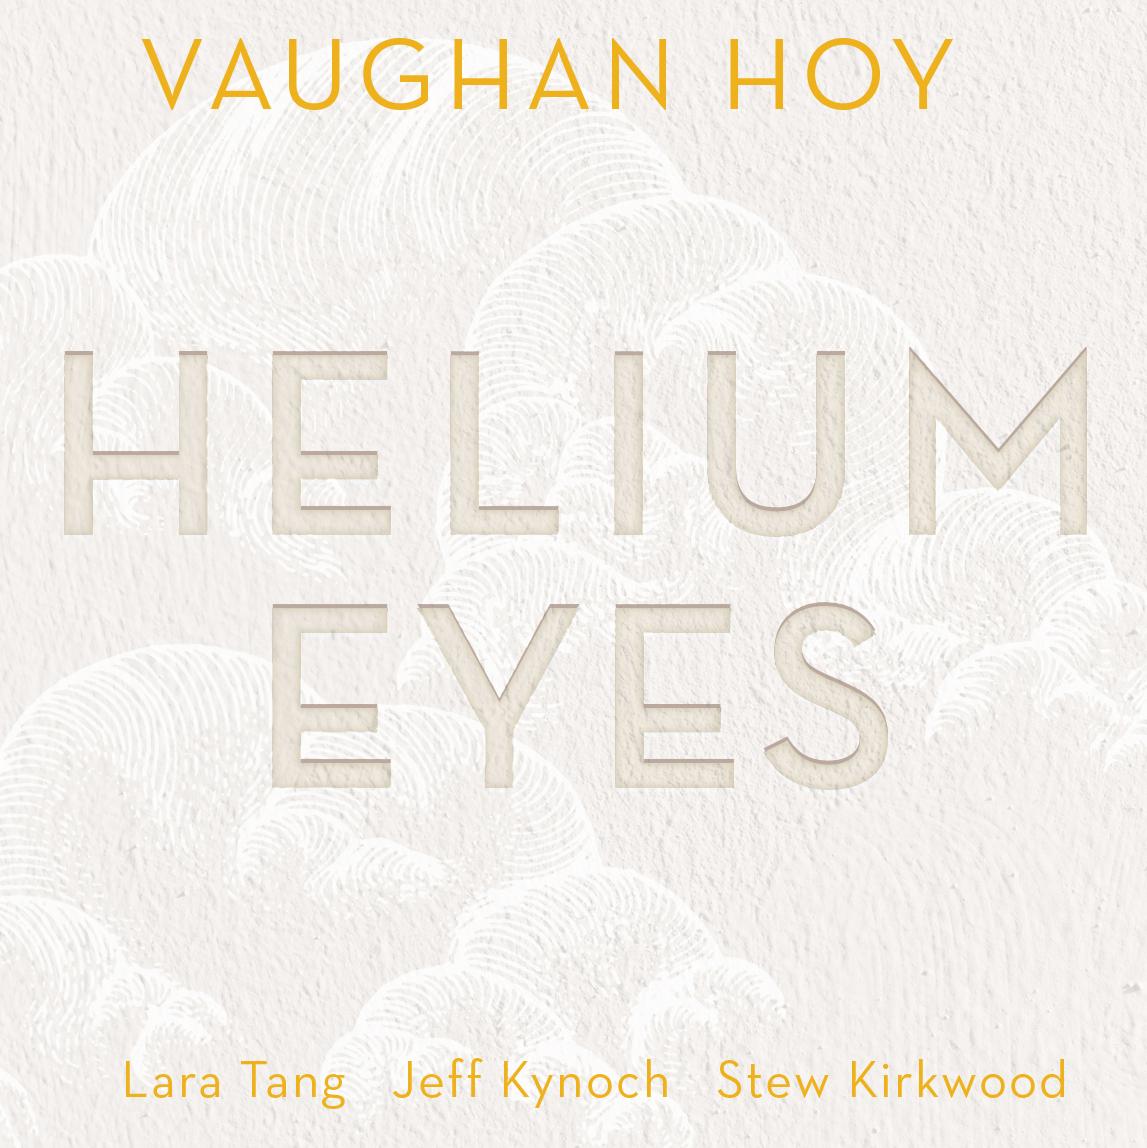 Album cover design by Kendel Vreeling of KendelMakes